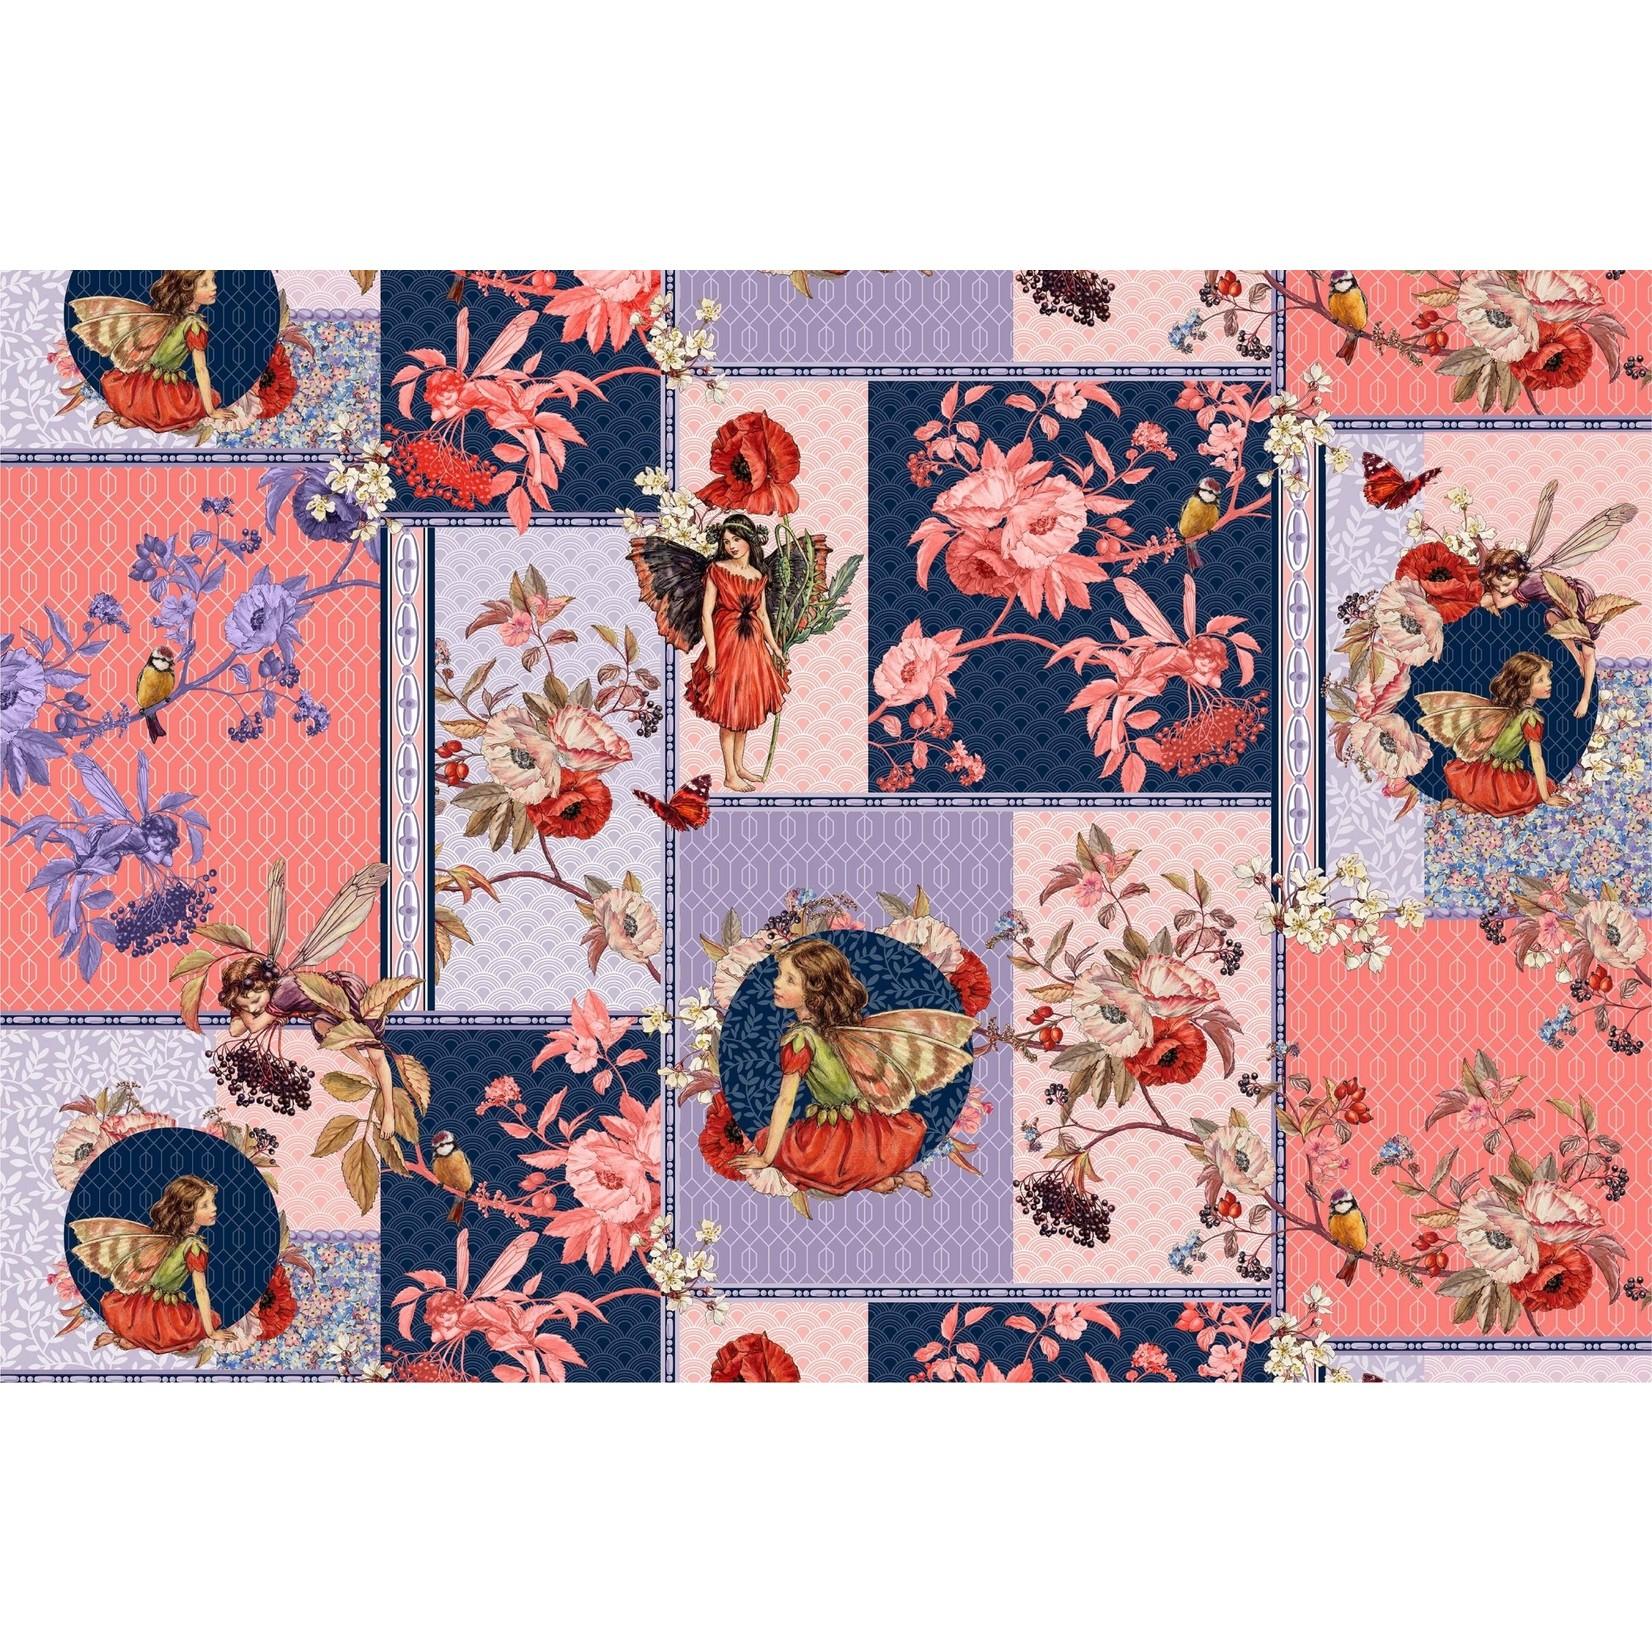 Michael Miller Elderberry Flower Fairies - Collage